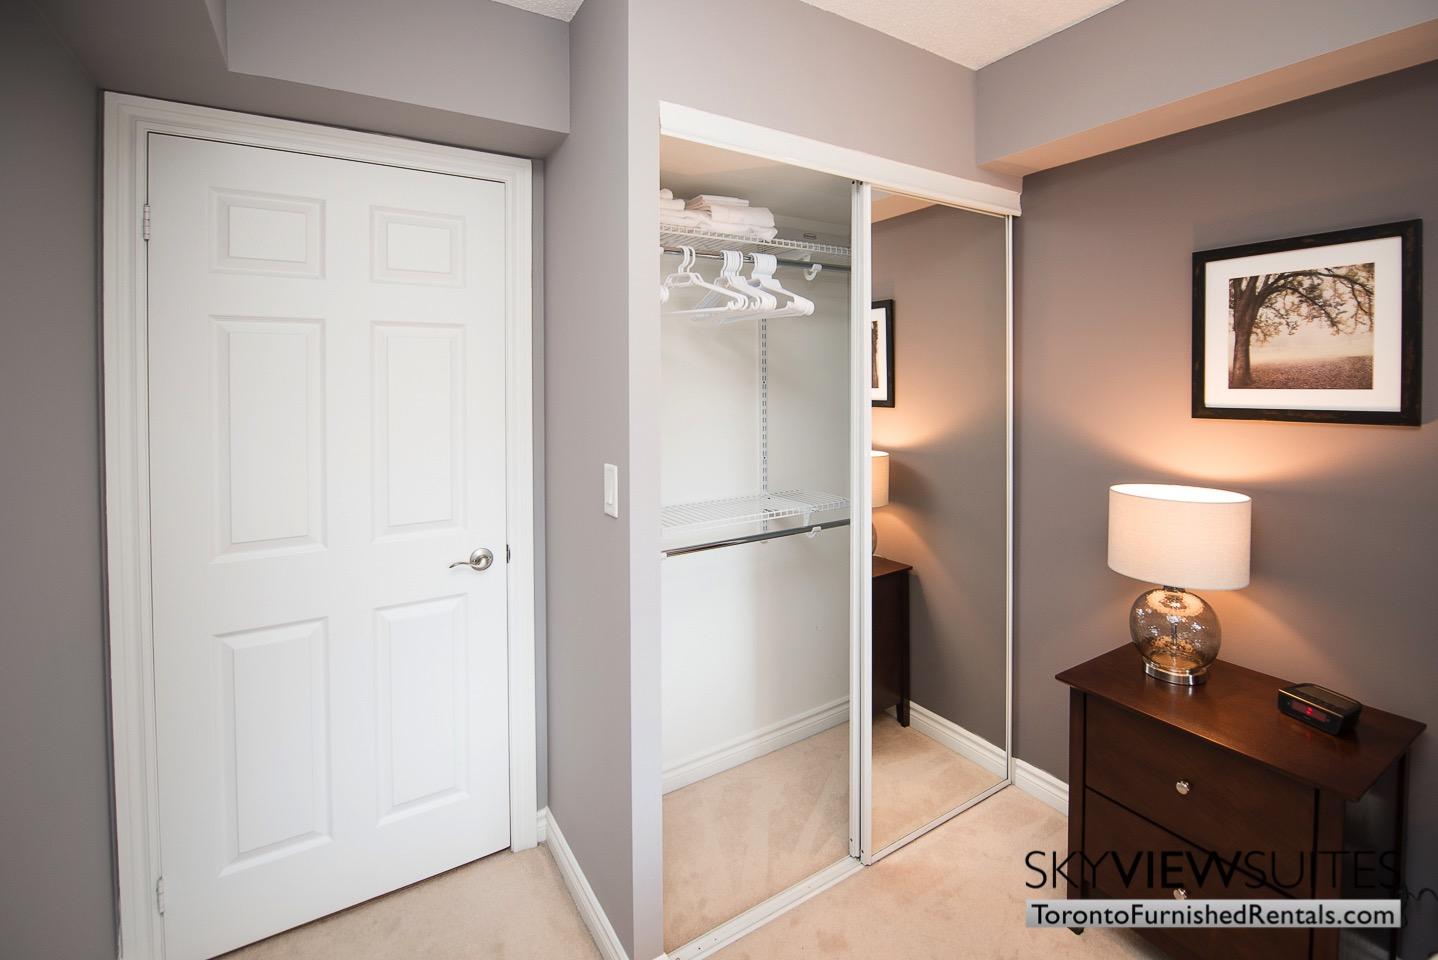 Wellington and Blue Jays Way executive rentals toronto bedroom closet space ample